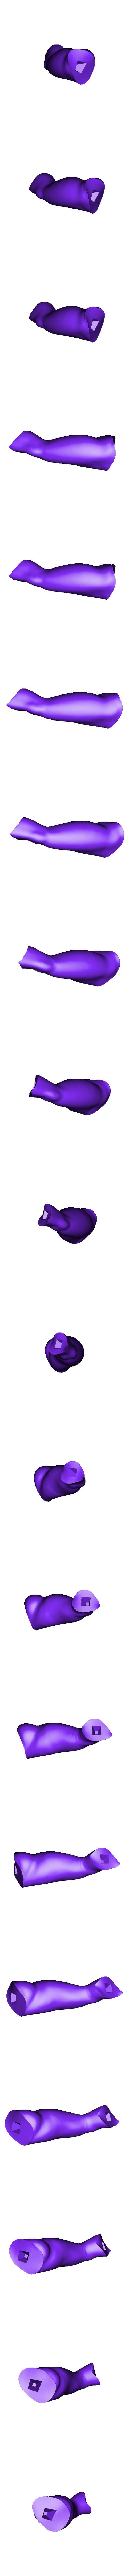 2.stl Download STL file Juri figure • Model to 3D print, RubenCastanho